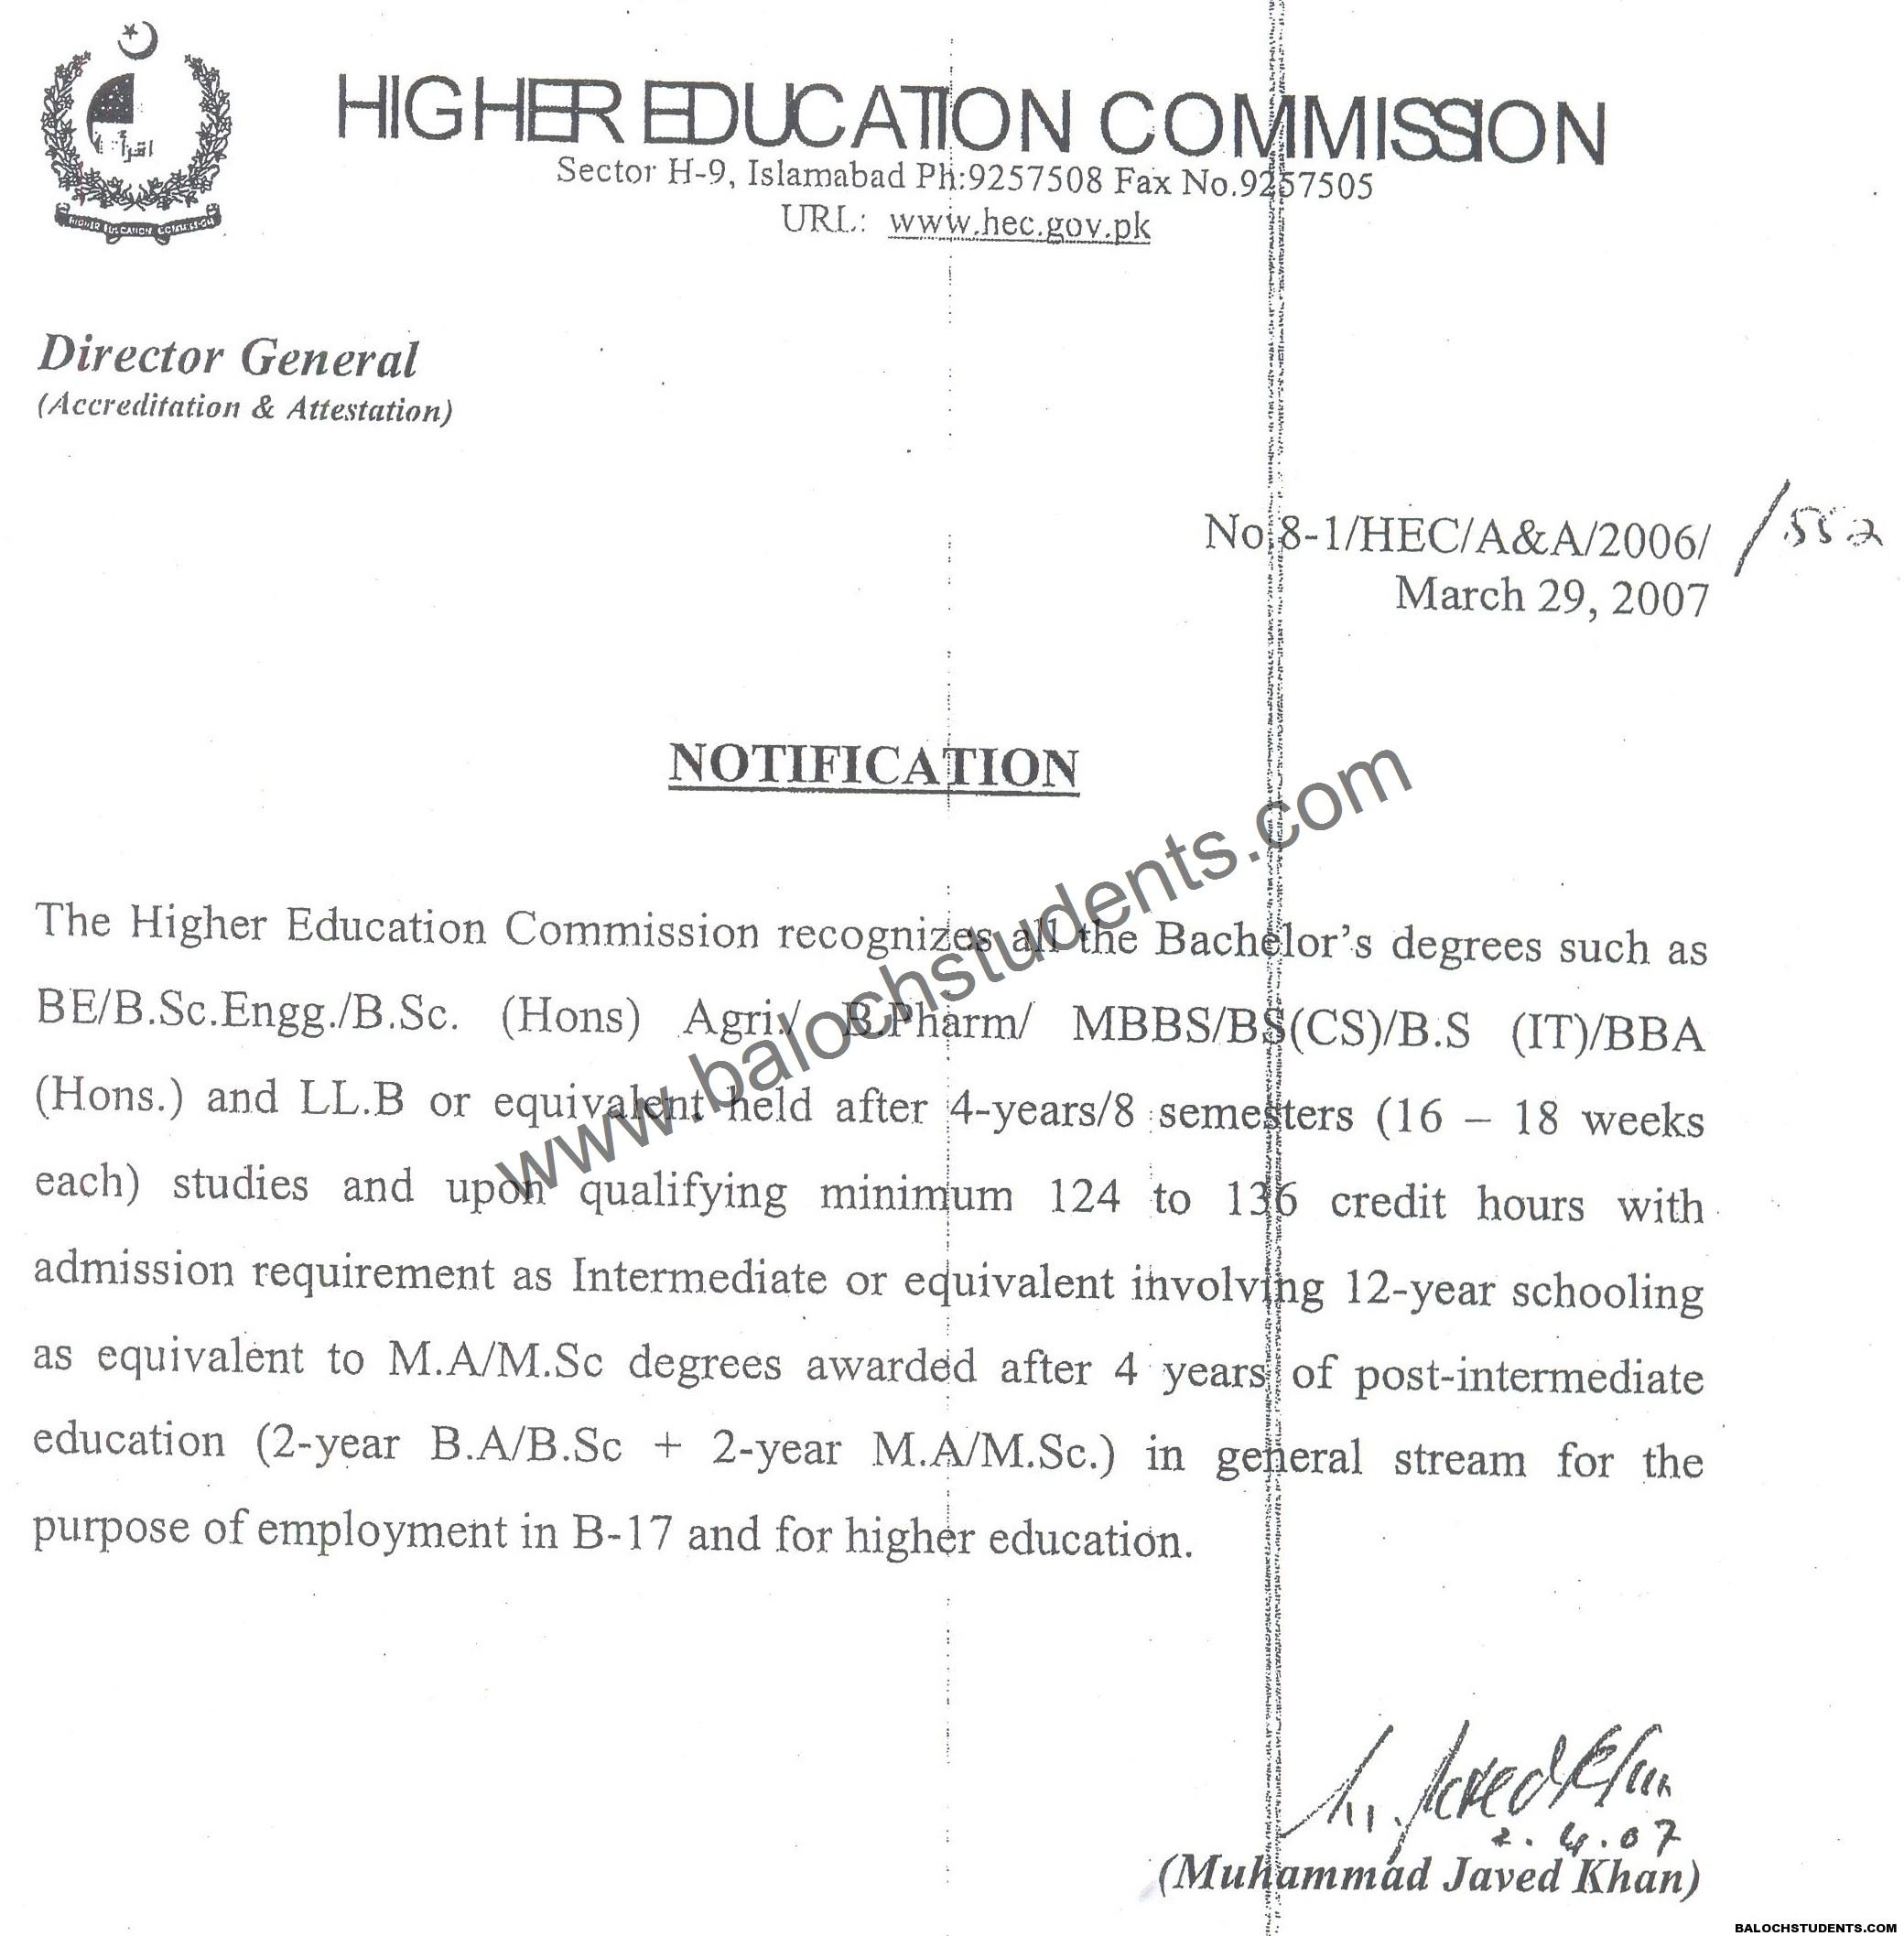 HEC Notification of 4-year Bachelor's Degree Program